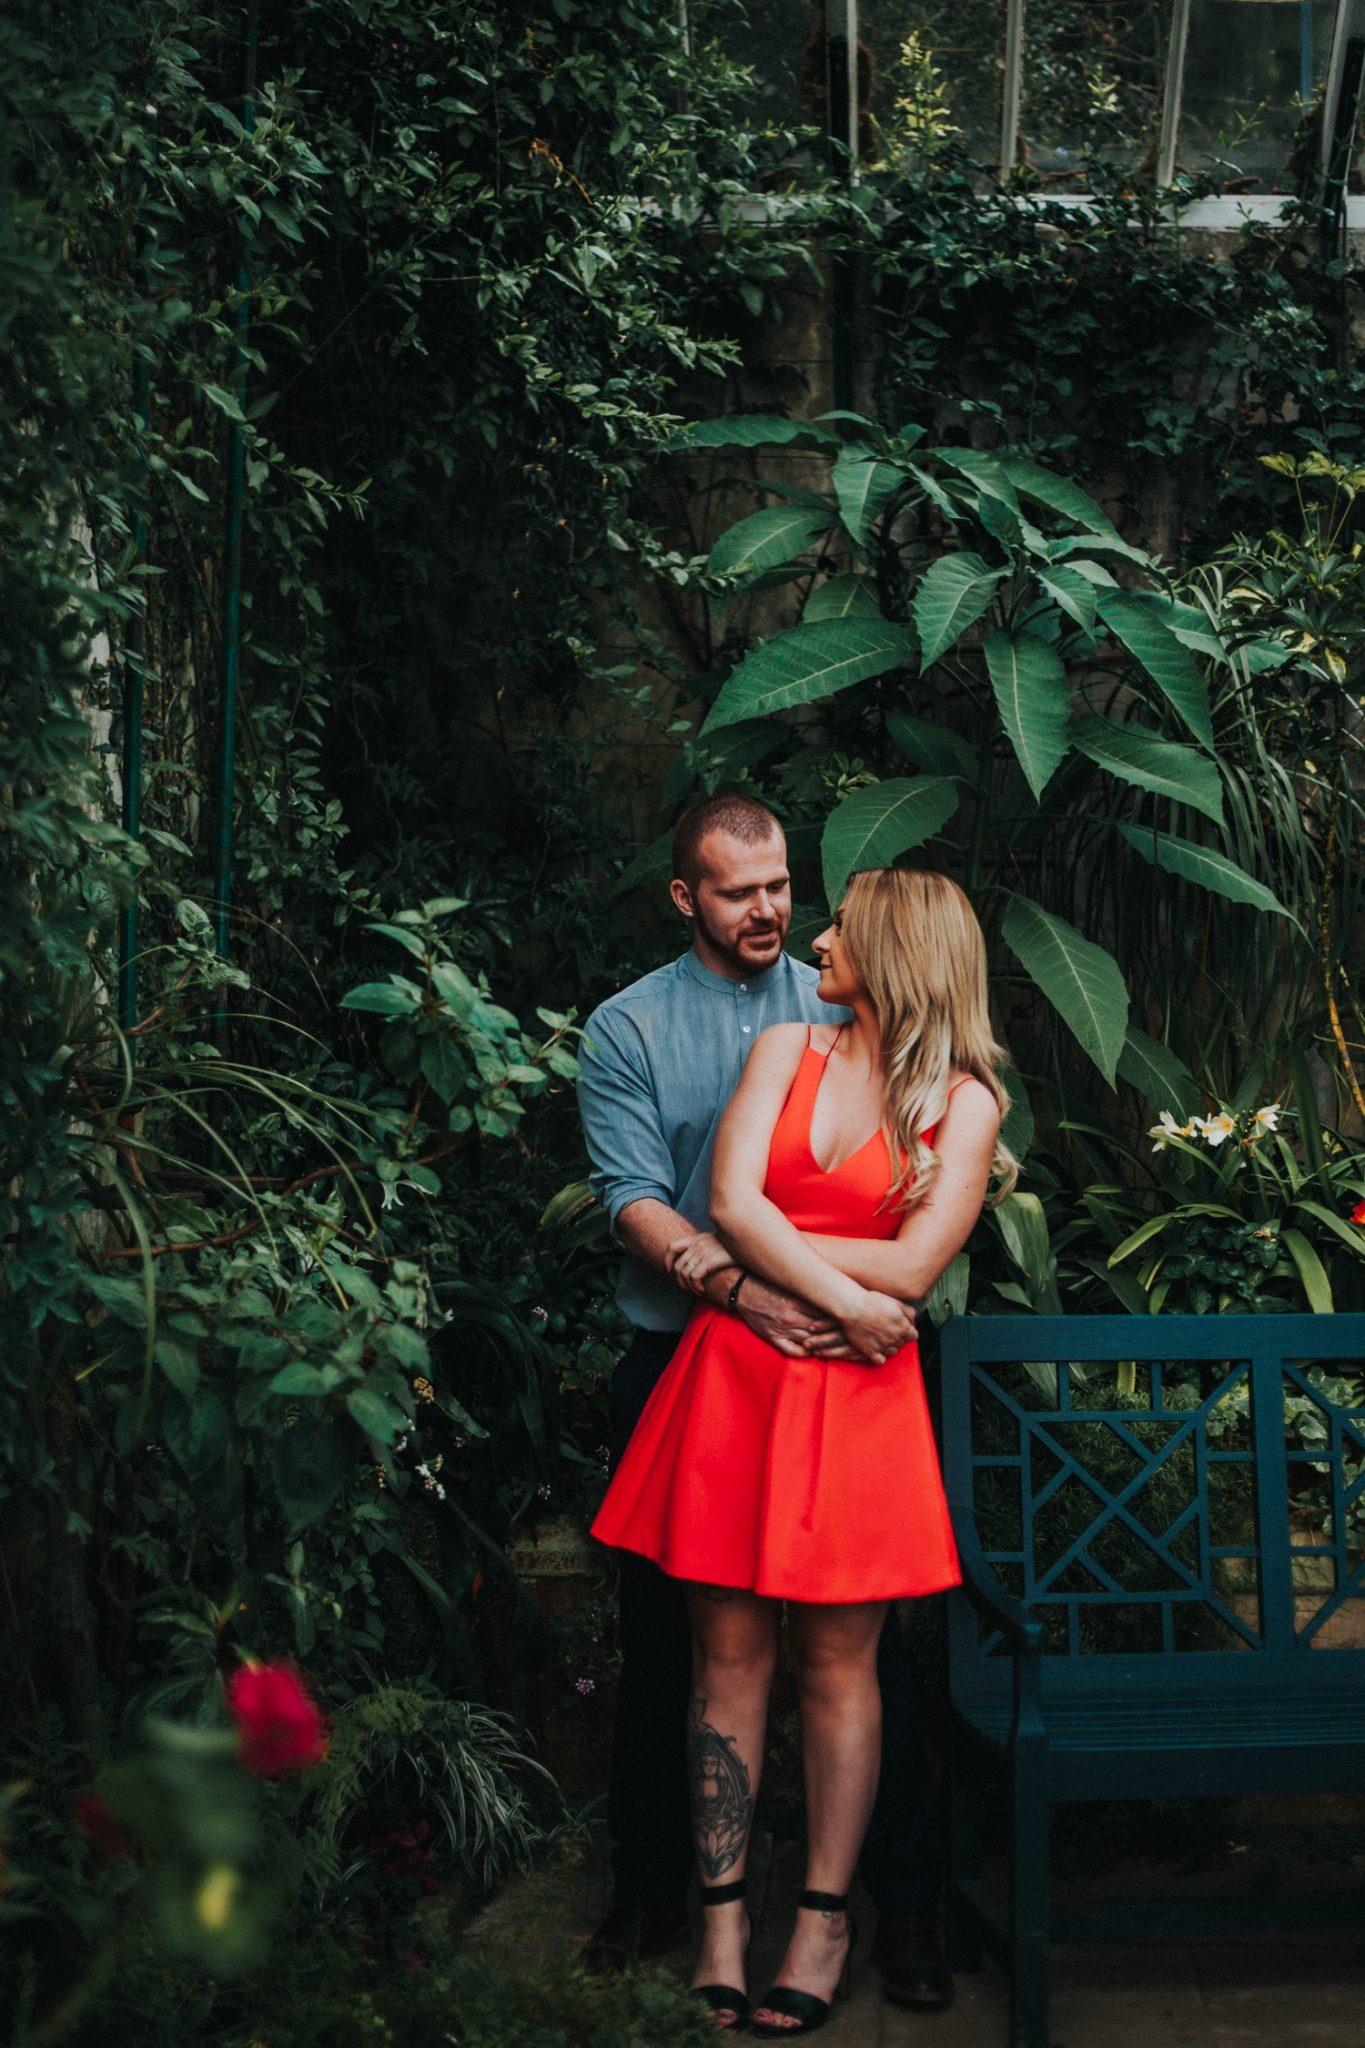 Engagement Photography Newcastle Upon Tyne - Pre-Wedding Session at Wallington Hall Greenhouse